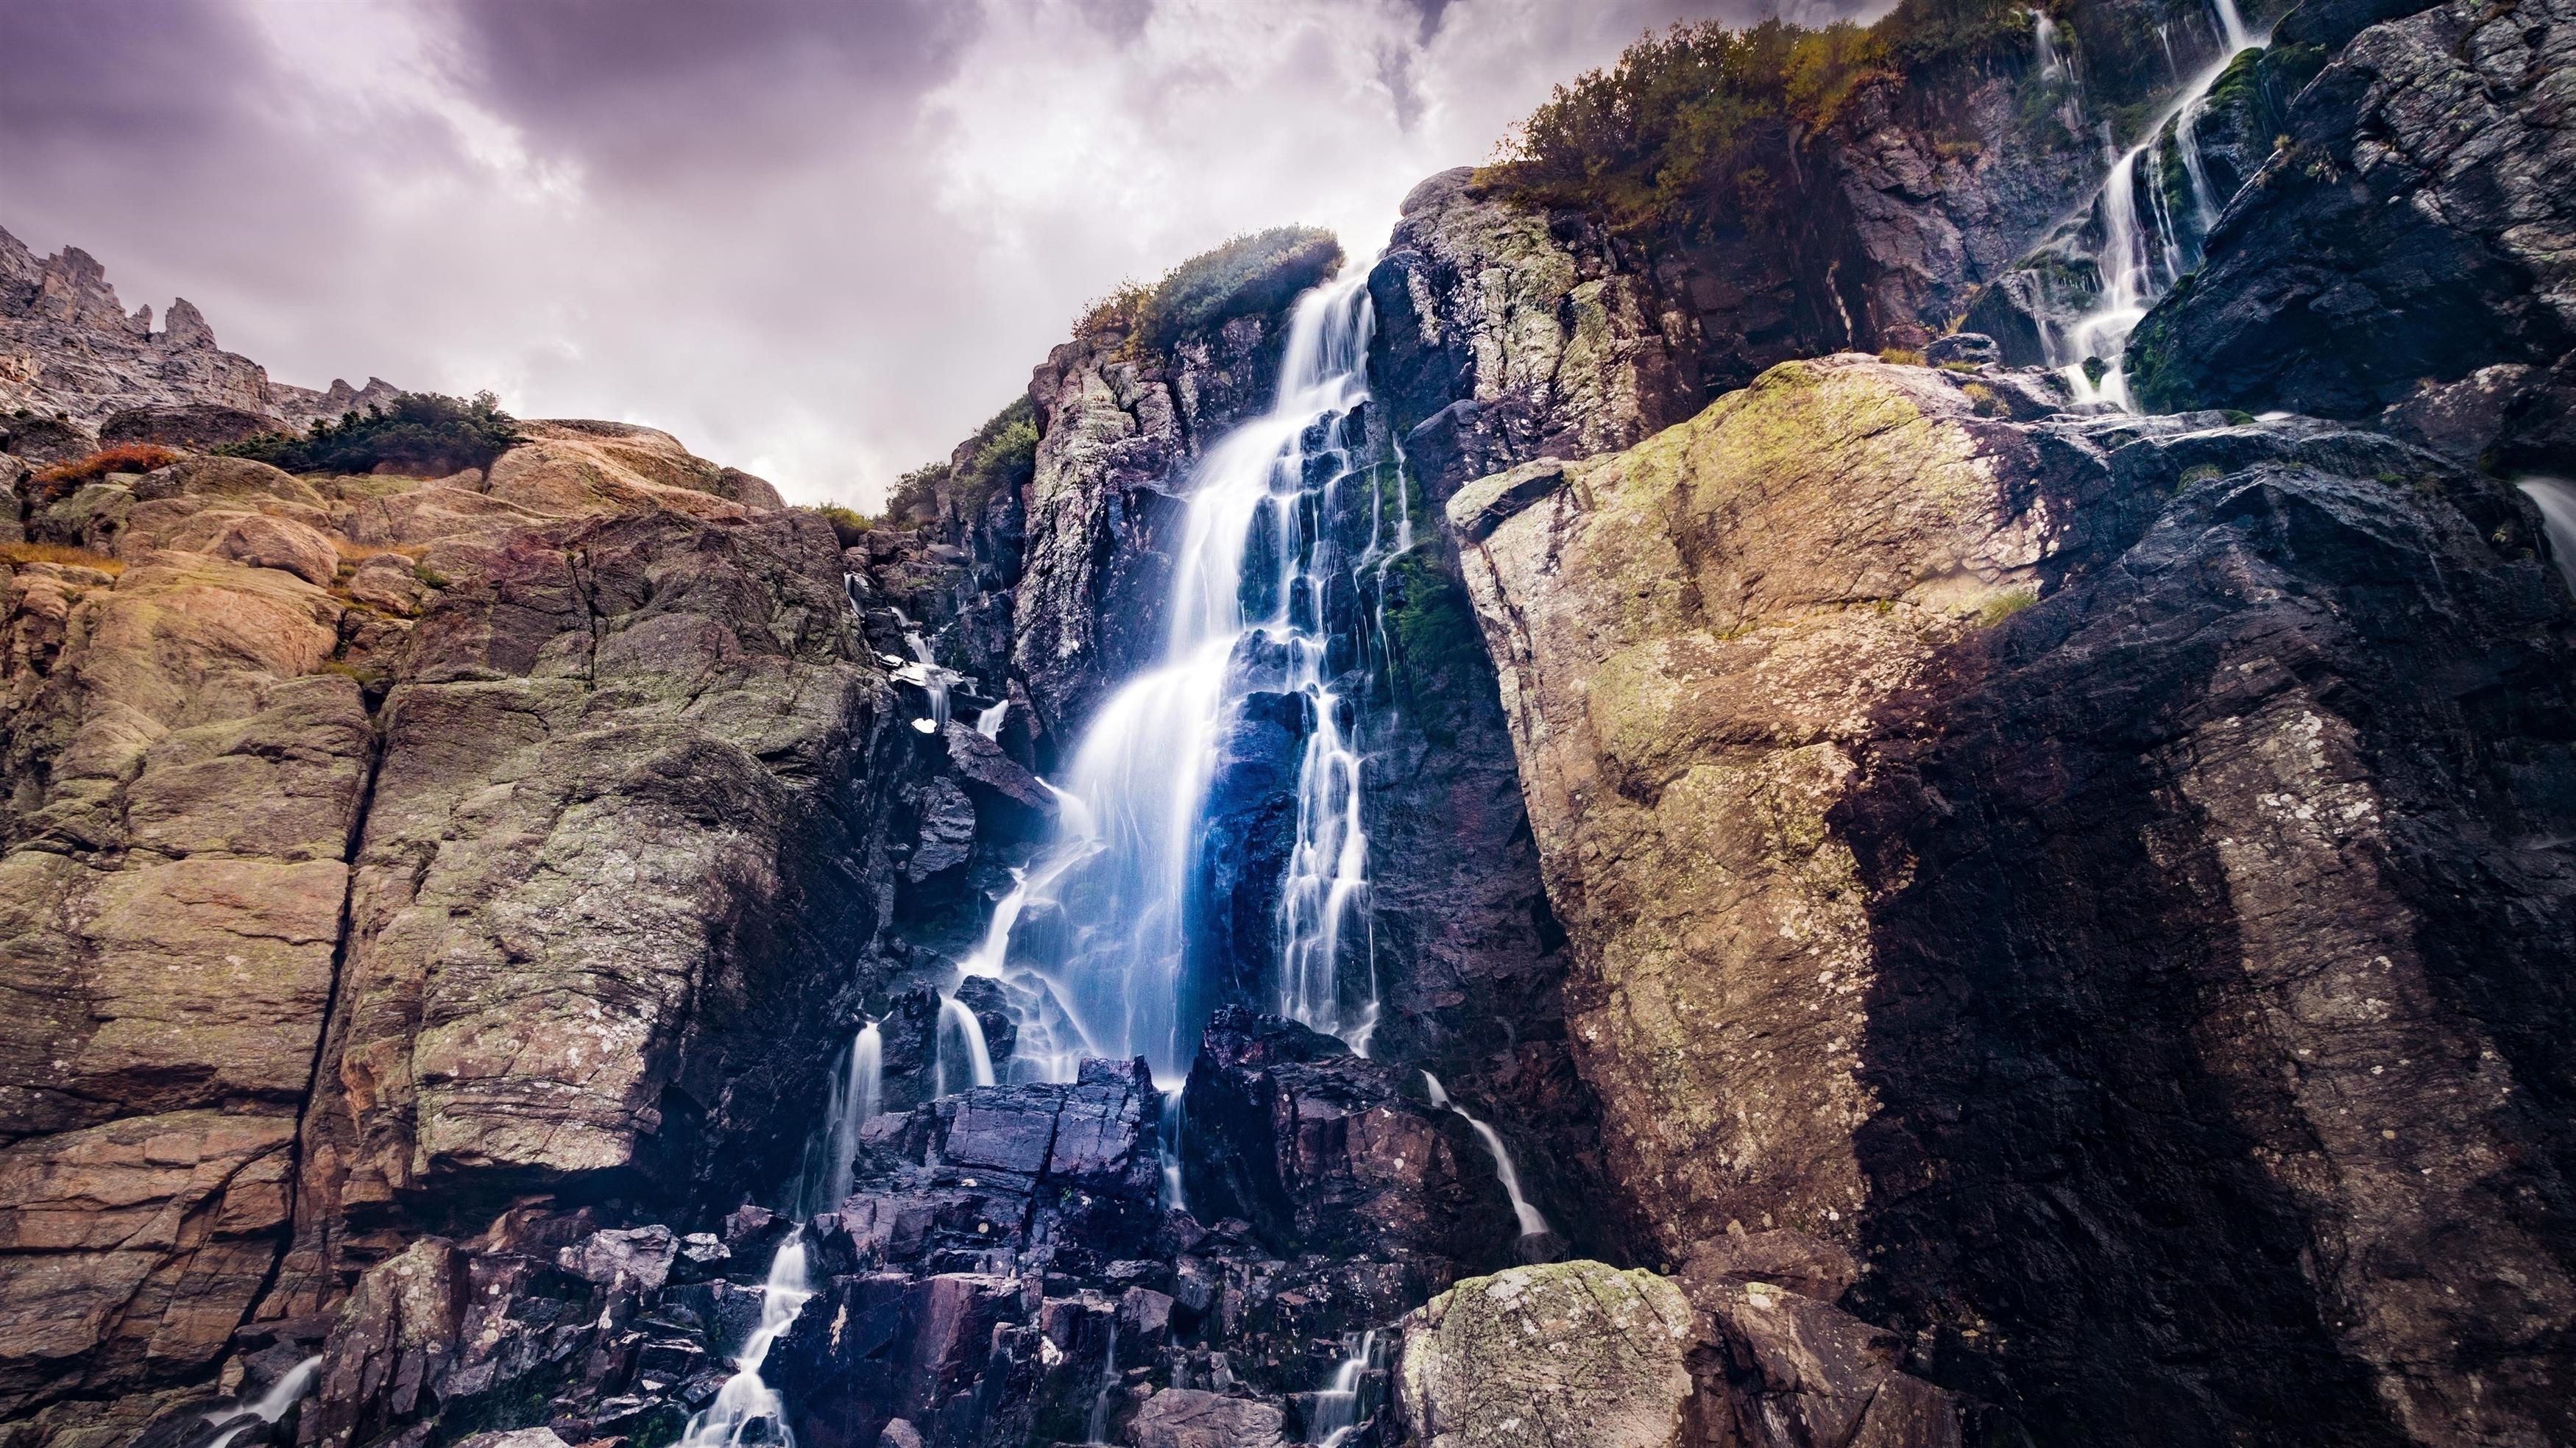 Waterfall from rocks обои скачать